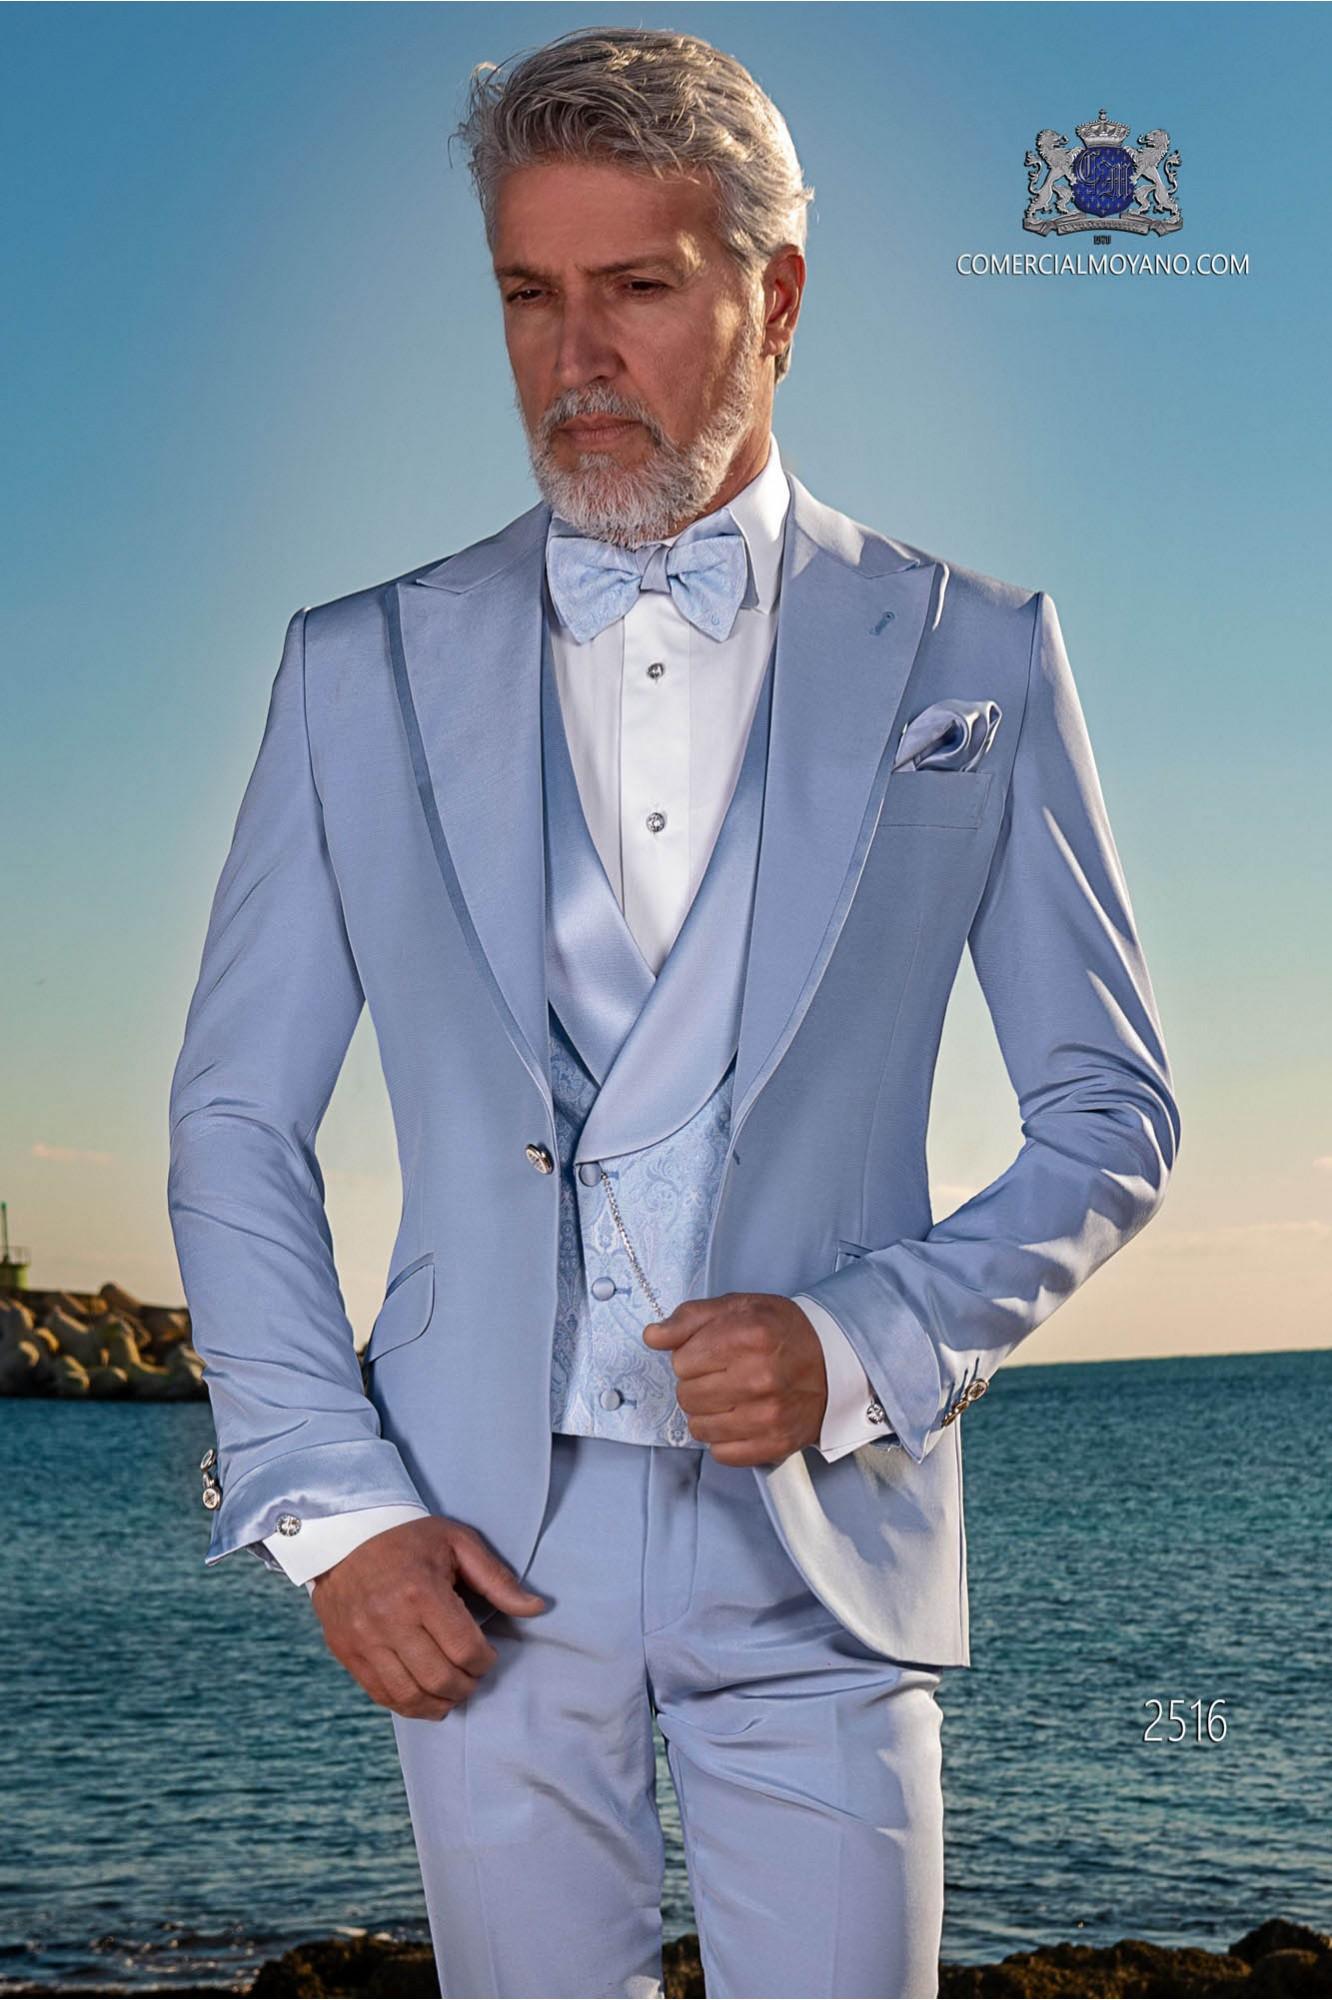 Traje italiano azul claro con moderno de solapa punta con vivos y 1 botón